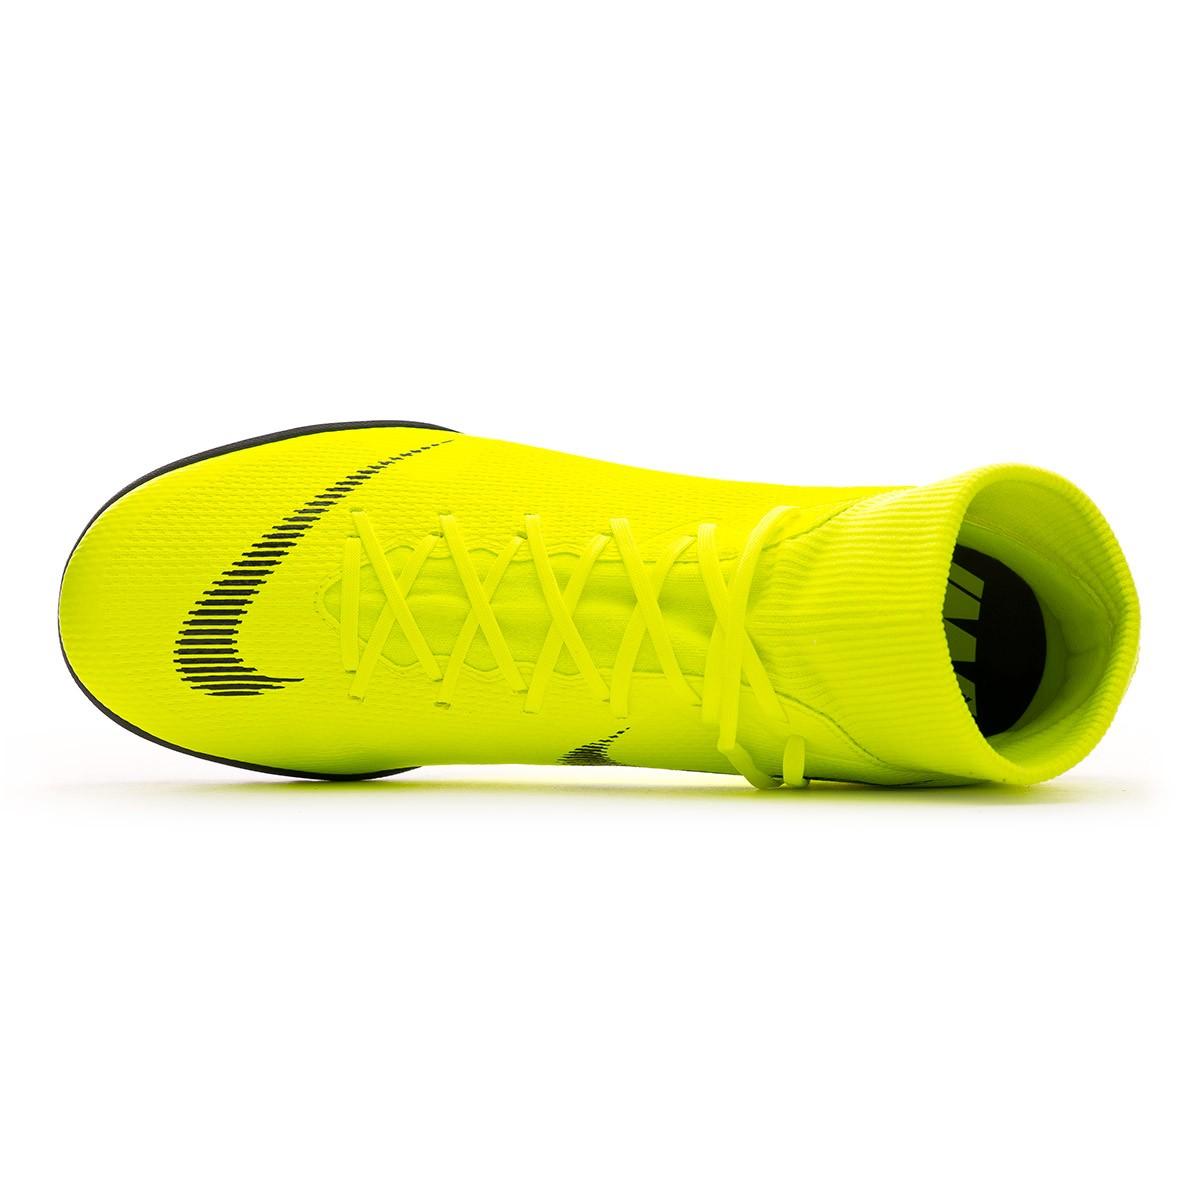 d6bd5da1444 Football Boot Nike Mercurial SuperflyX VI Academy Turf Volt-Black - Tienda  de fútbol Fútbol Emotion